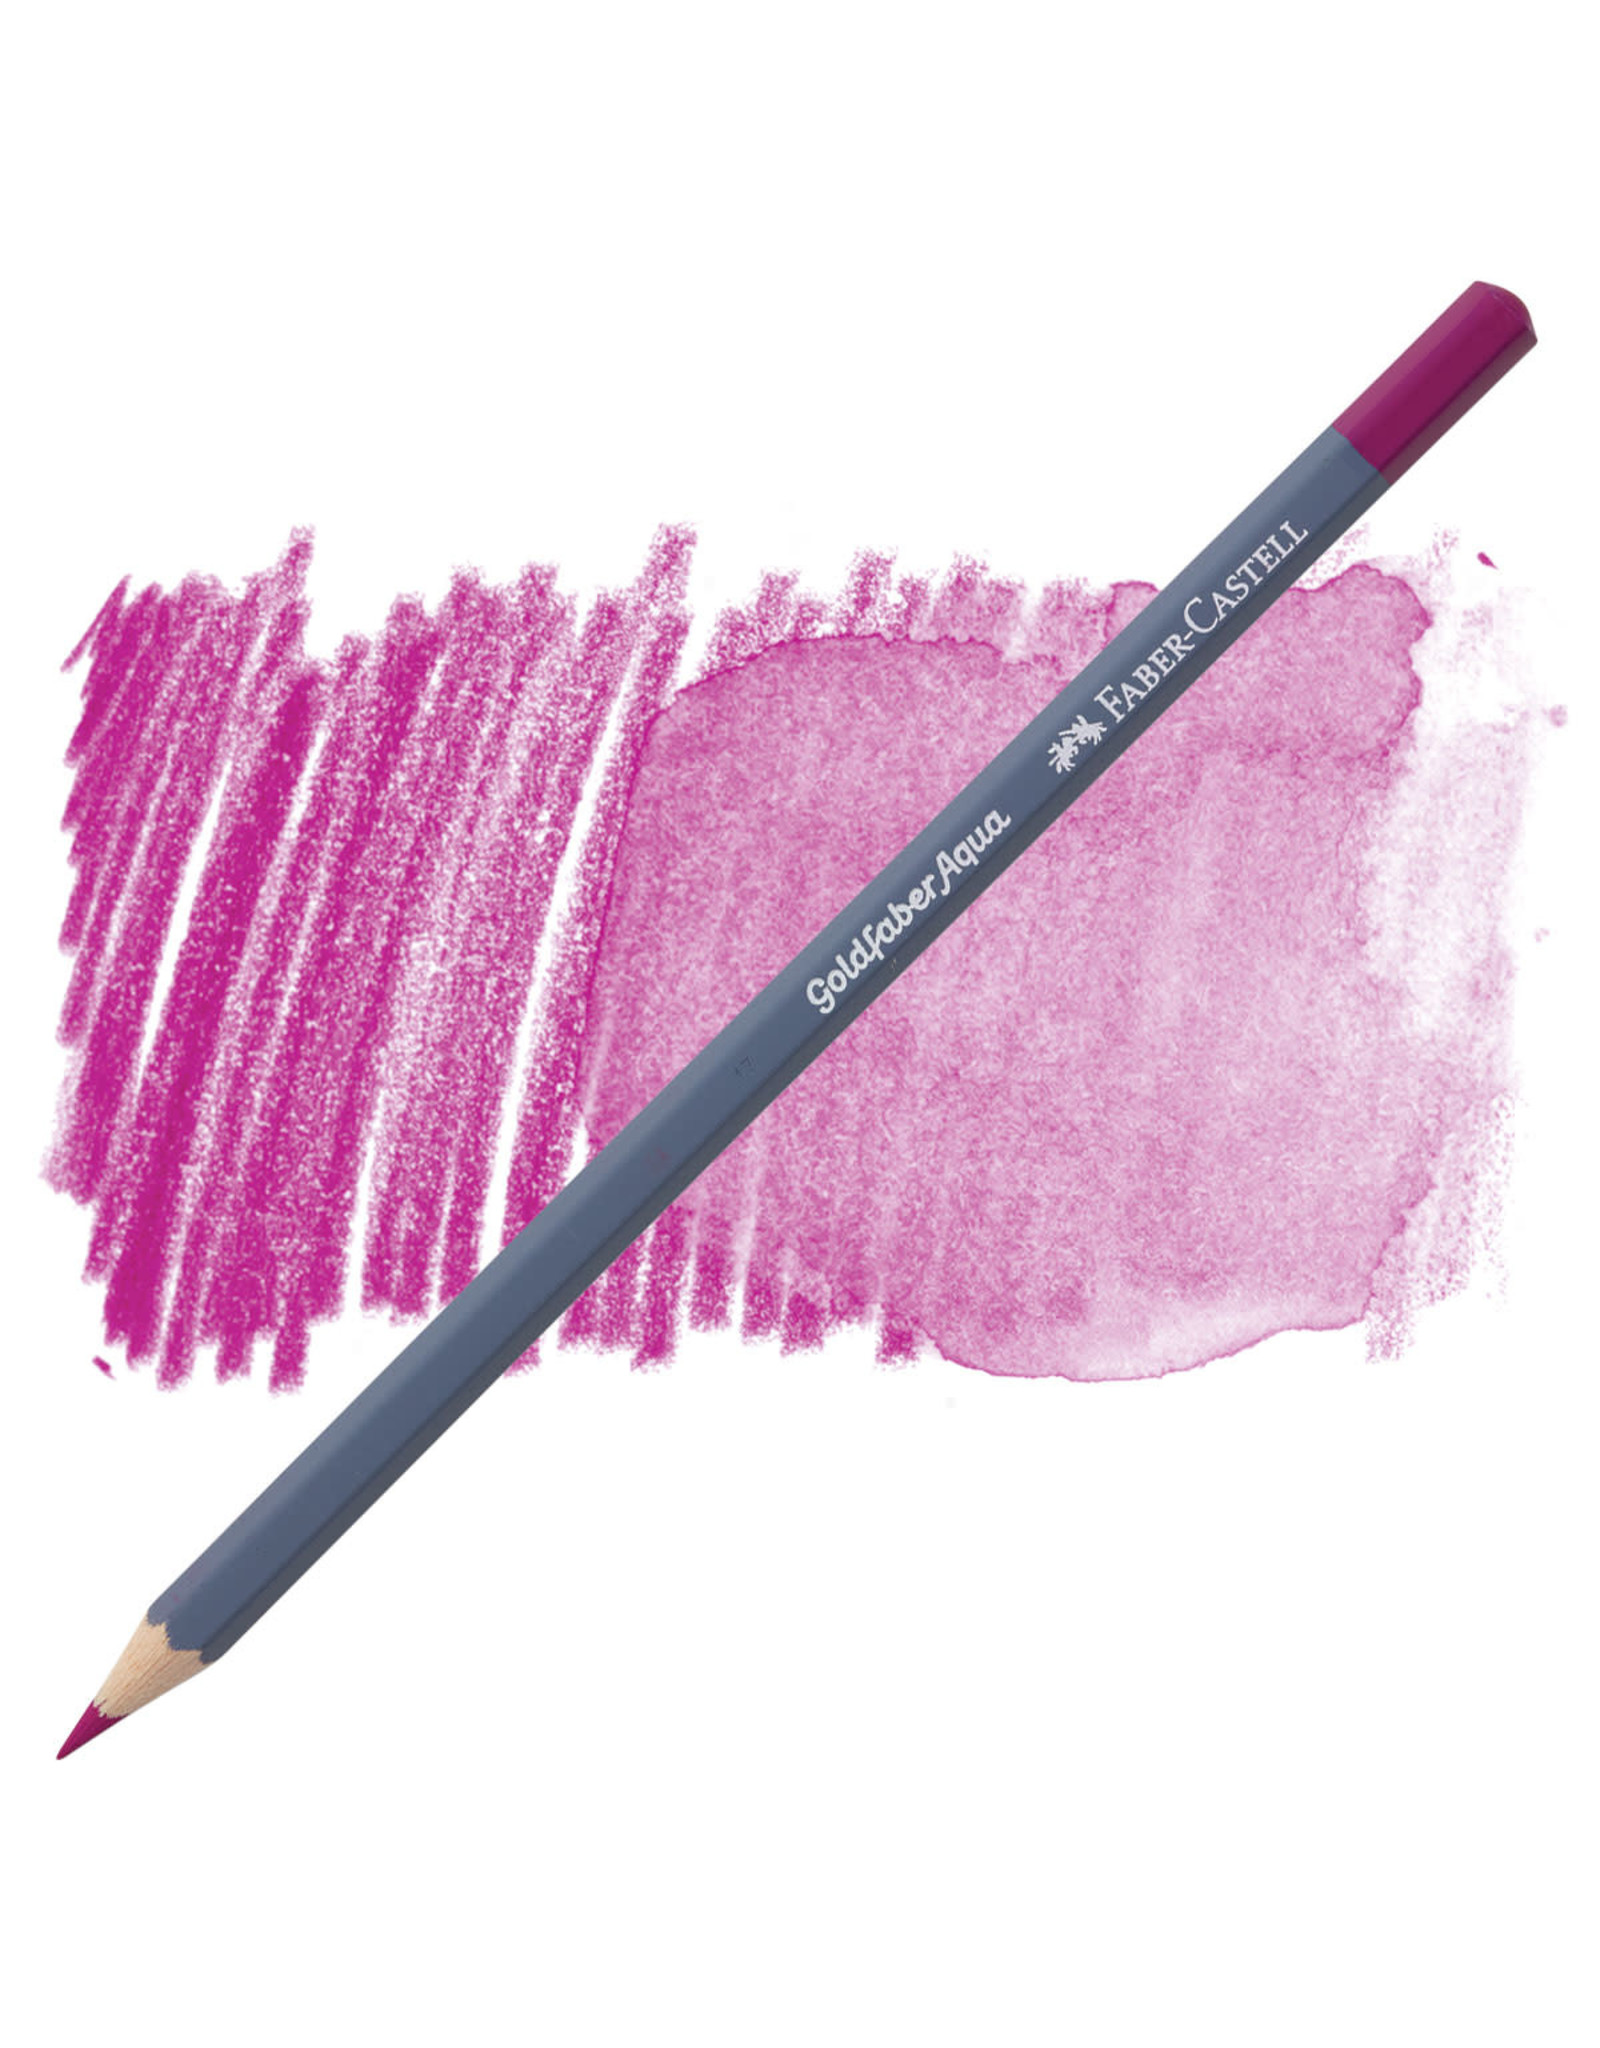 Faber-Castell Goldfaber Aqua Watercolor Pencil - Middle Purple Pink #125